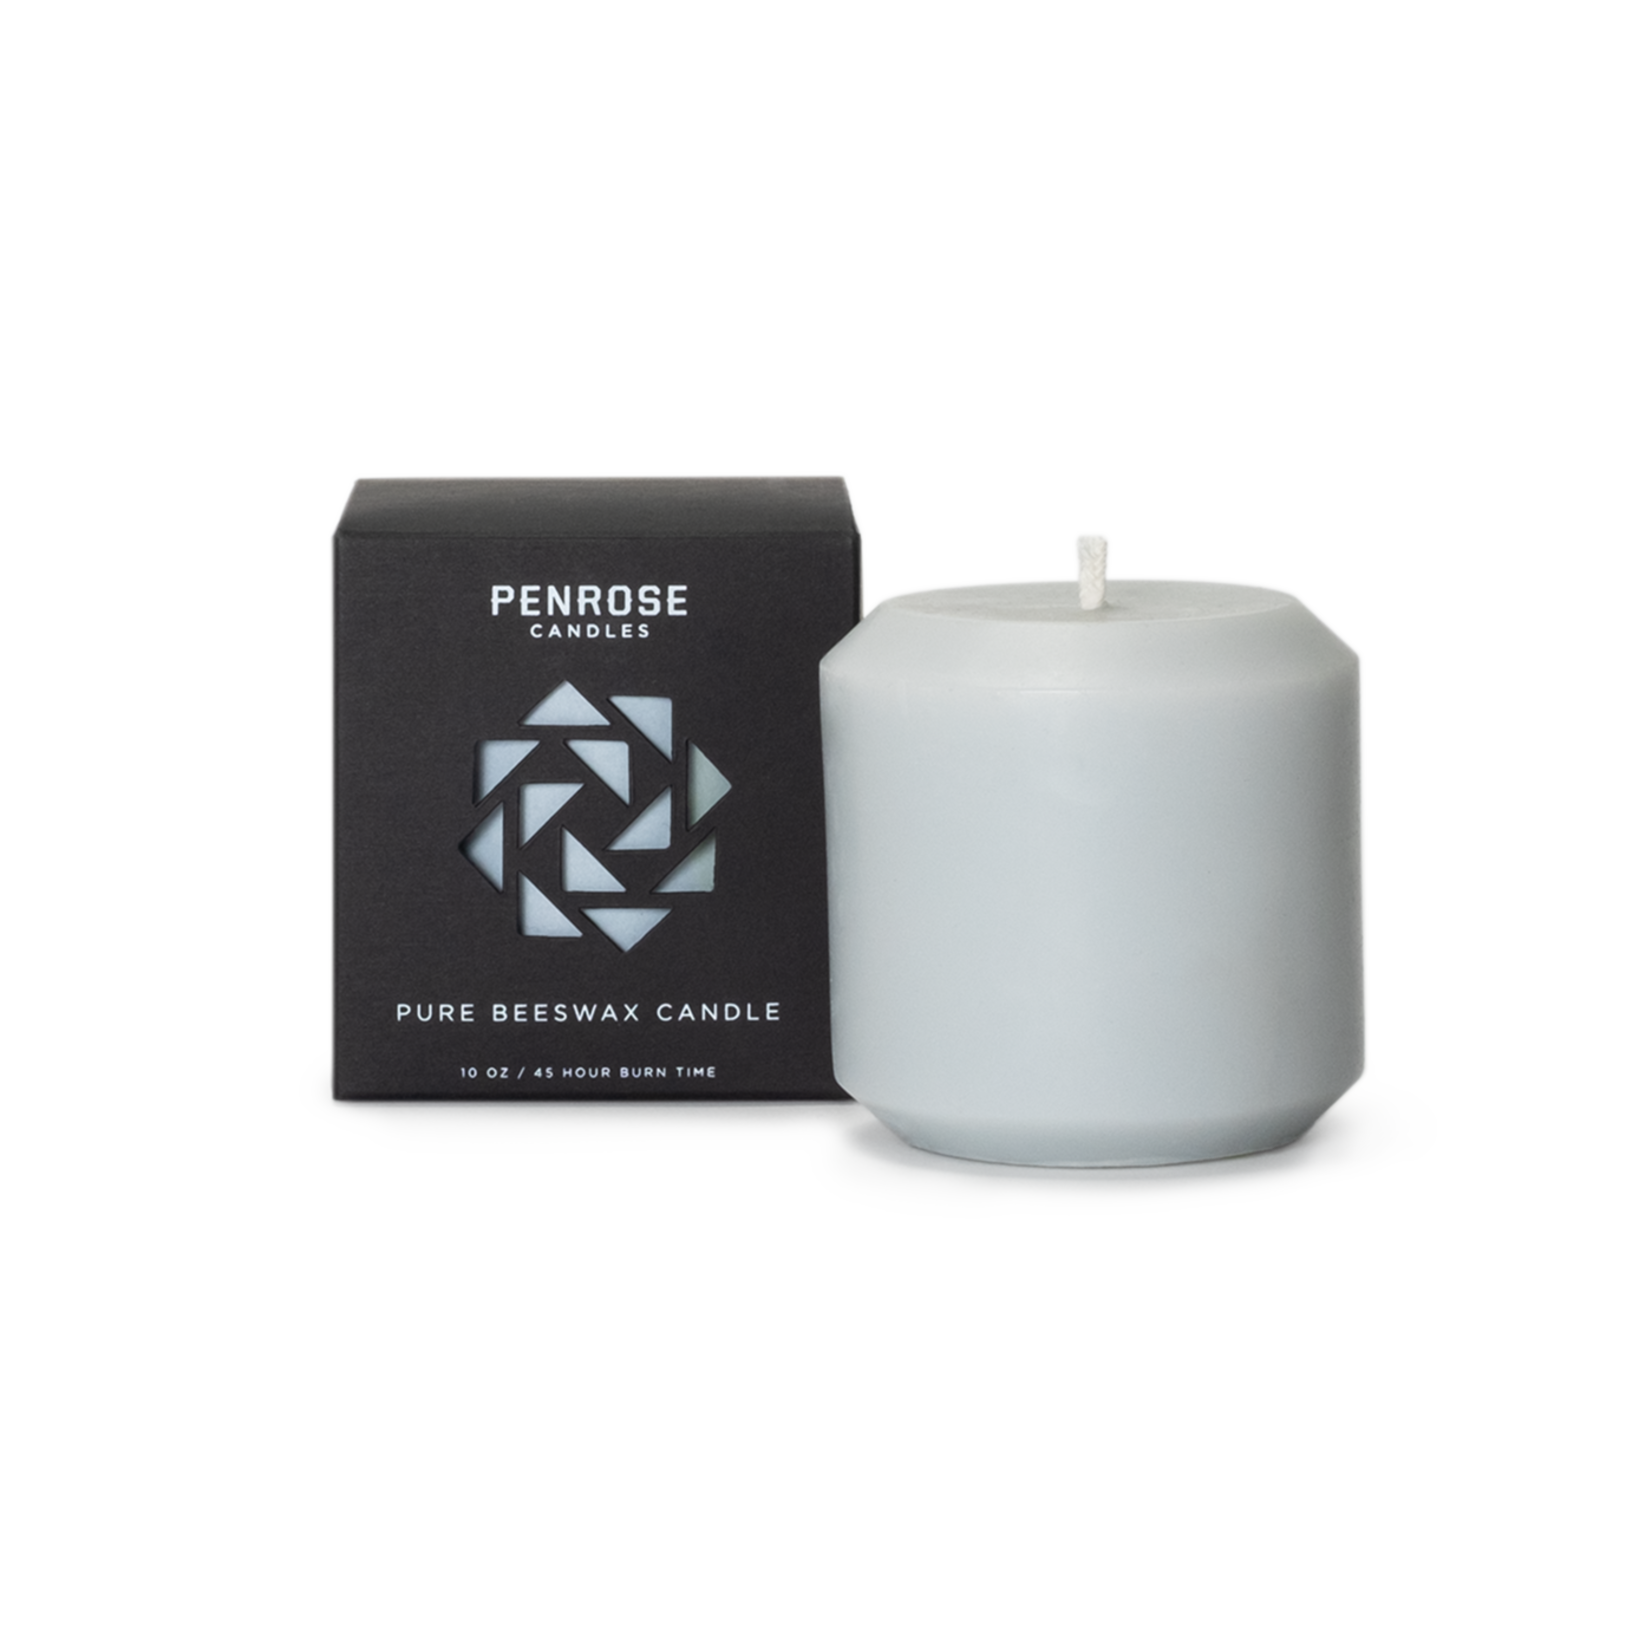 Penrose Candles Beeswax Pillar Candle